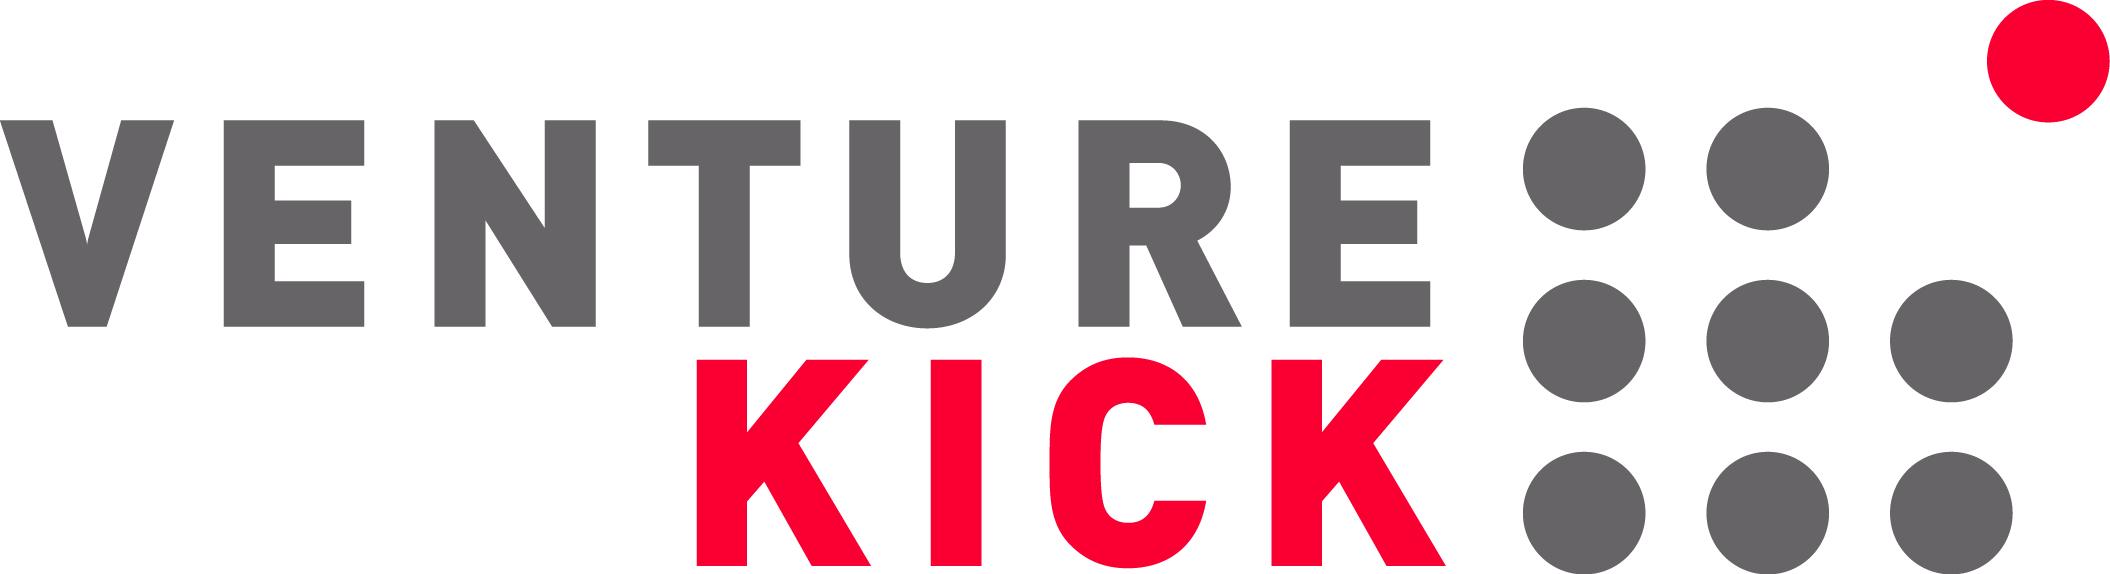 Logo VentureKick